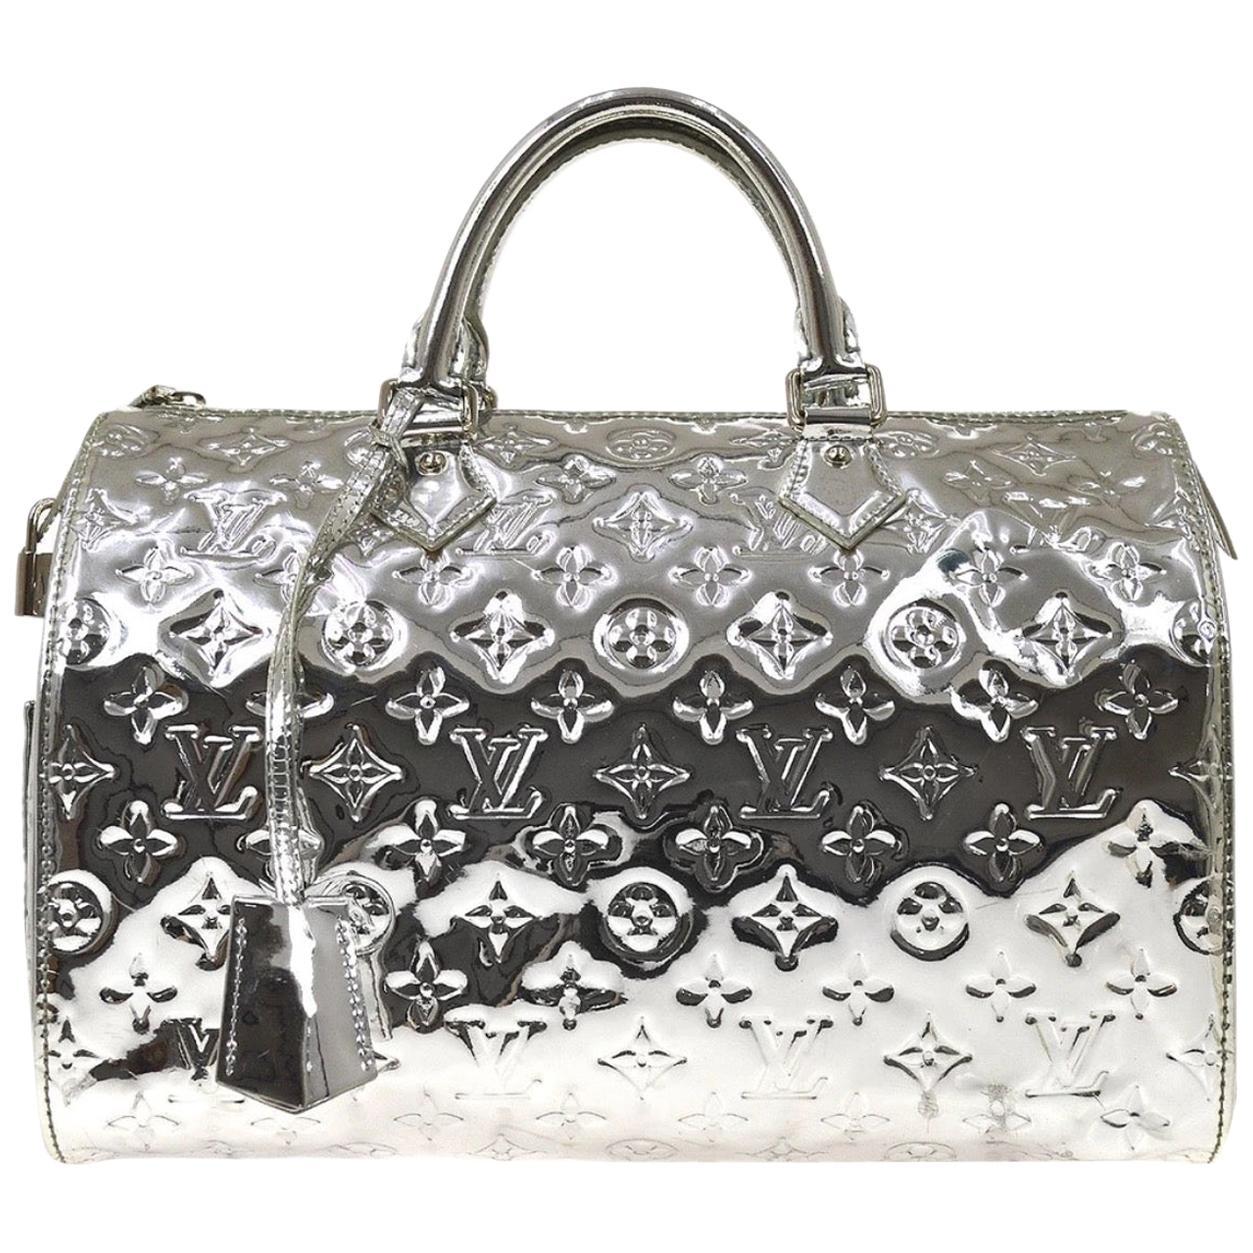 Louis Vuitton Silver Monogram Miroir Speedy 30 Top Handle Shoulder Bag